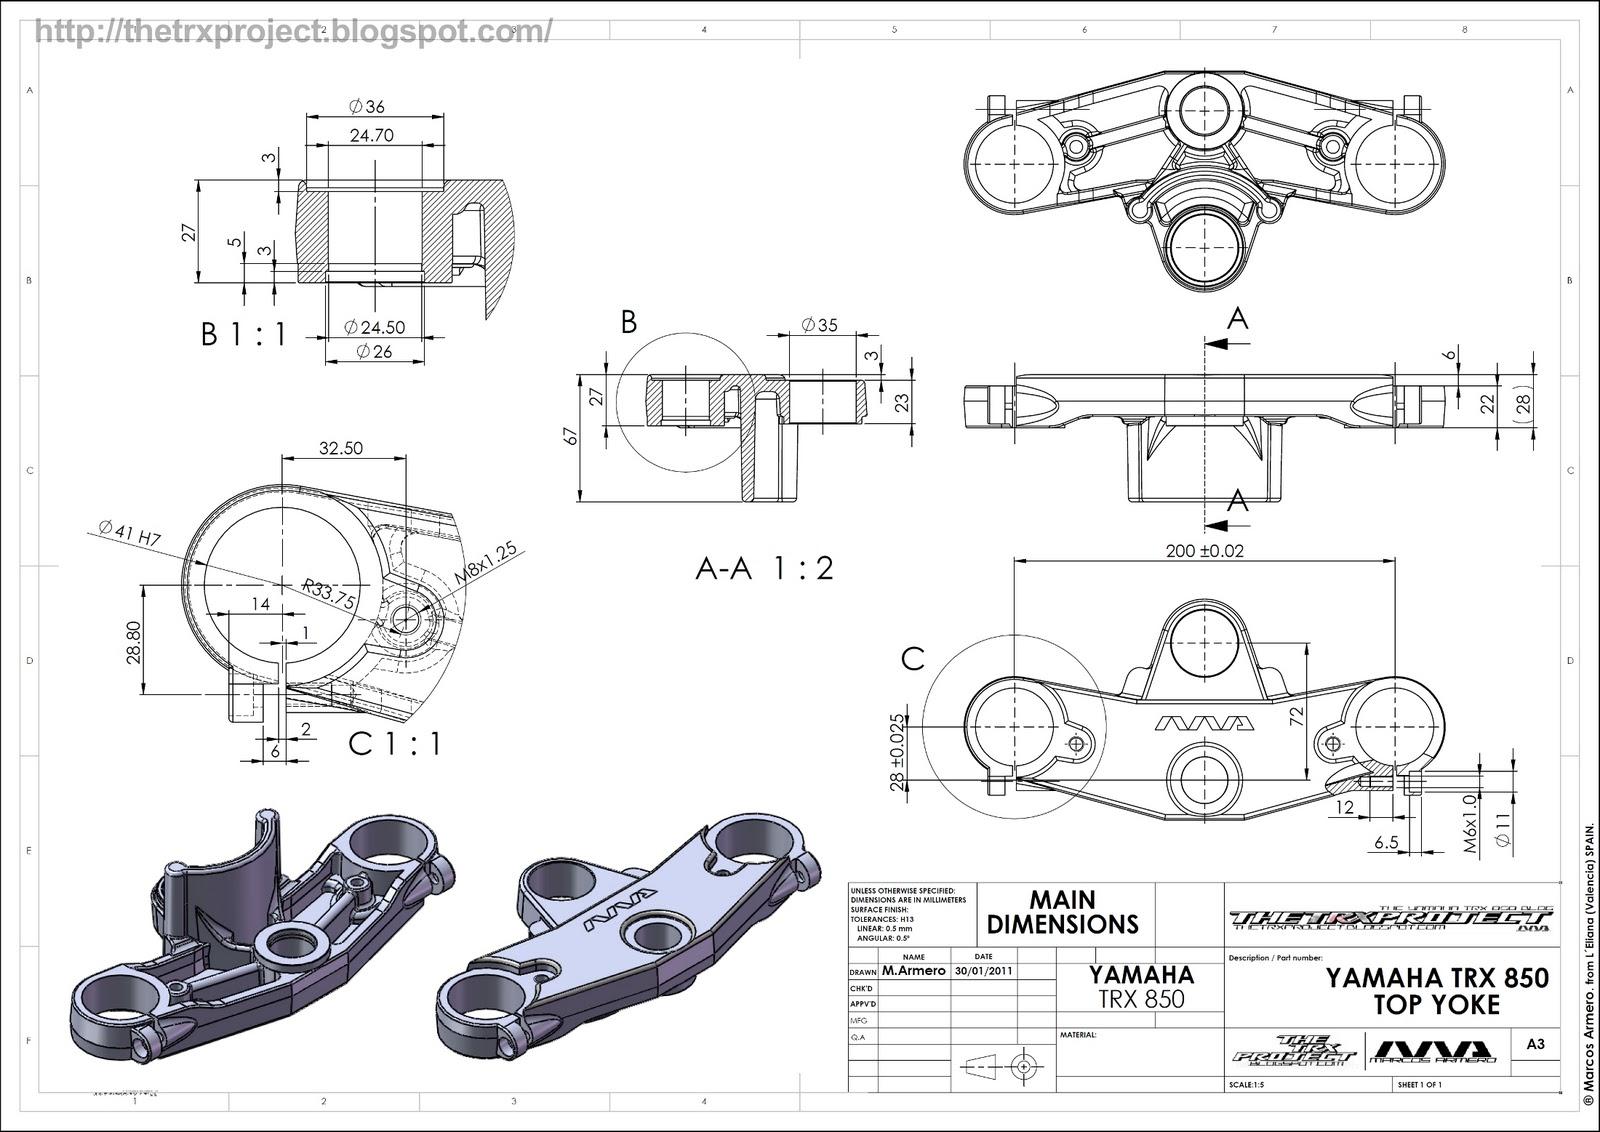 sports garage themed ideas - The TRX Project The Yamaha TRX 850 blog Yamaha TRX 850